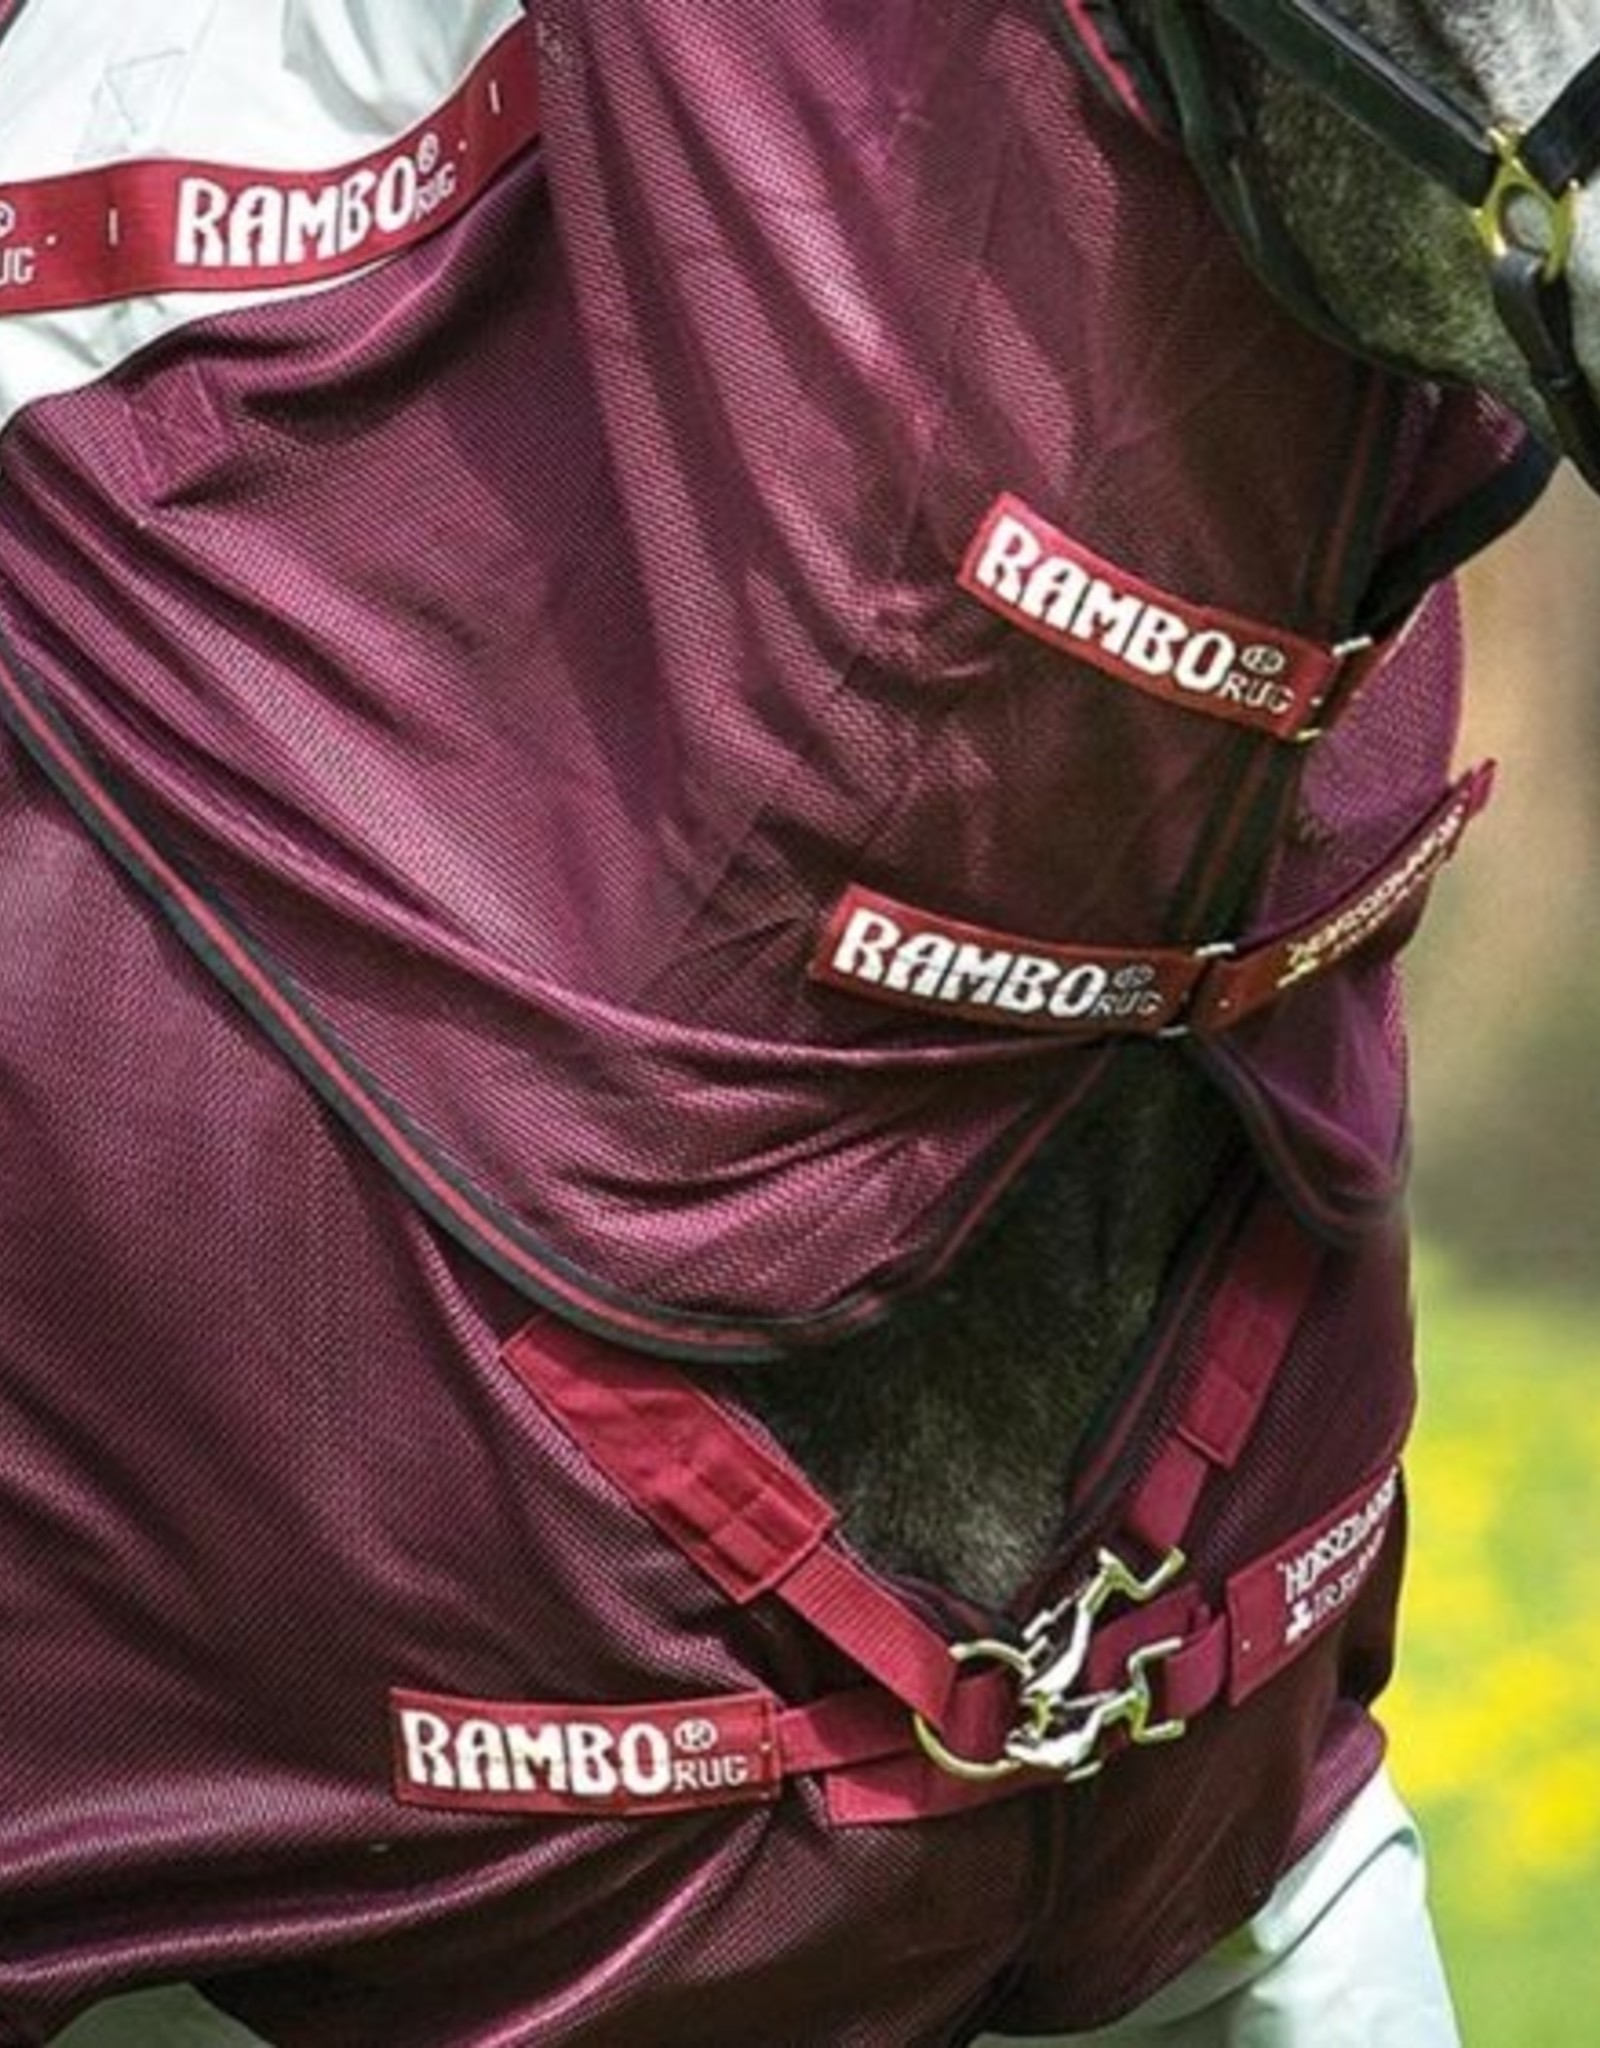 RAMBO SUMMER SERIES TURNOUT 0G